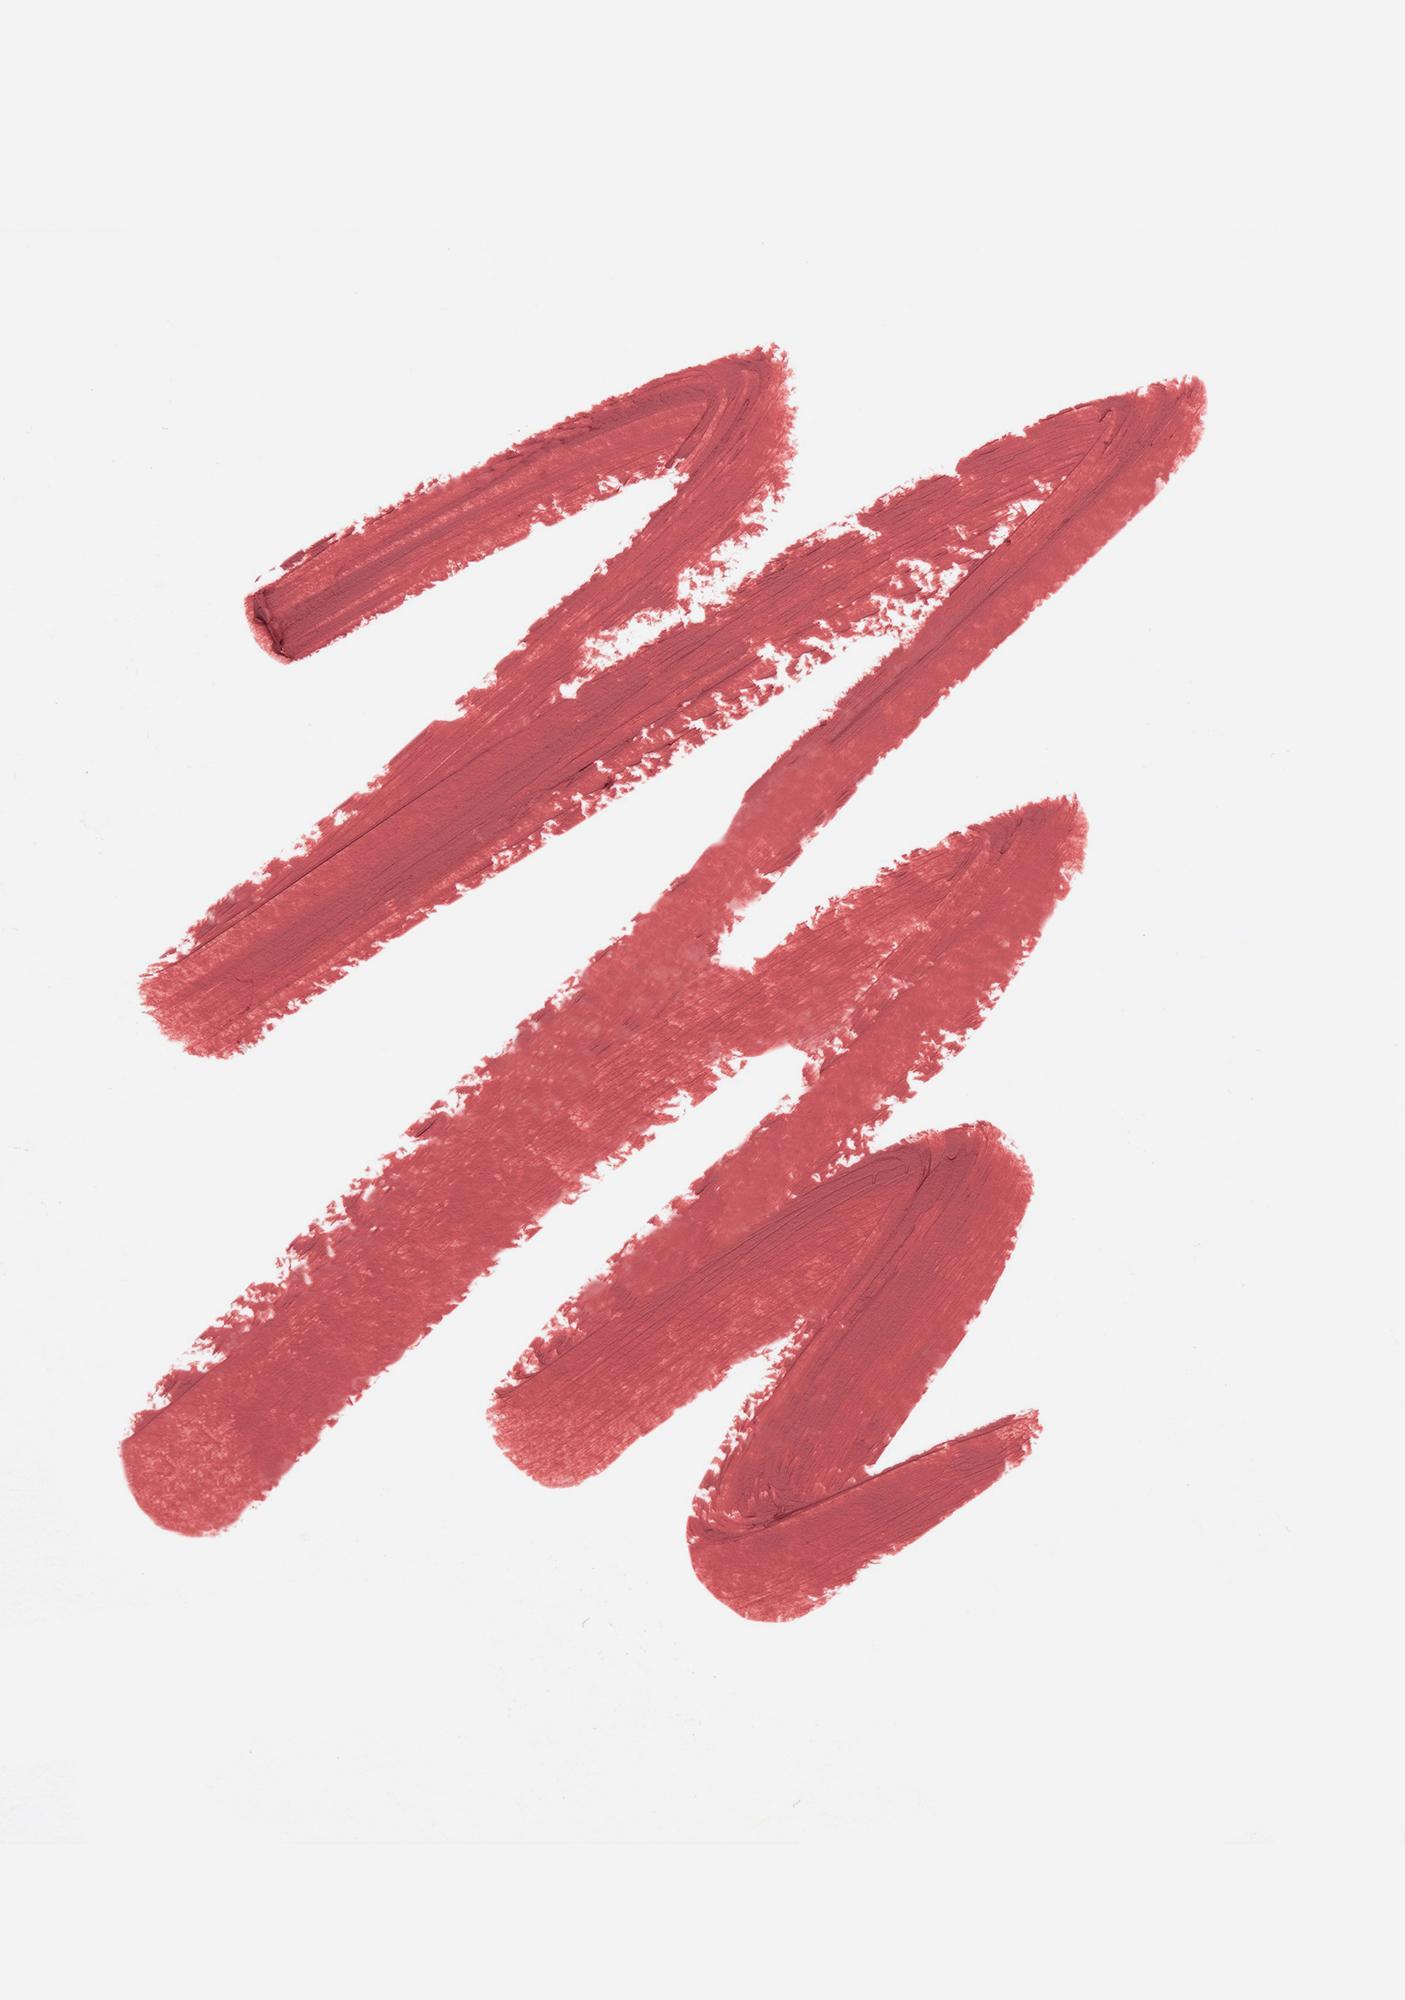 TPSY Off Limits Lip Crayon